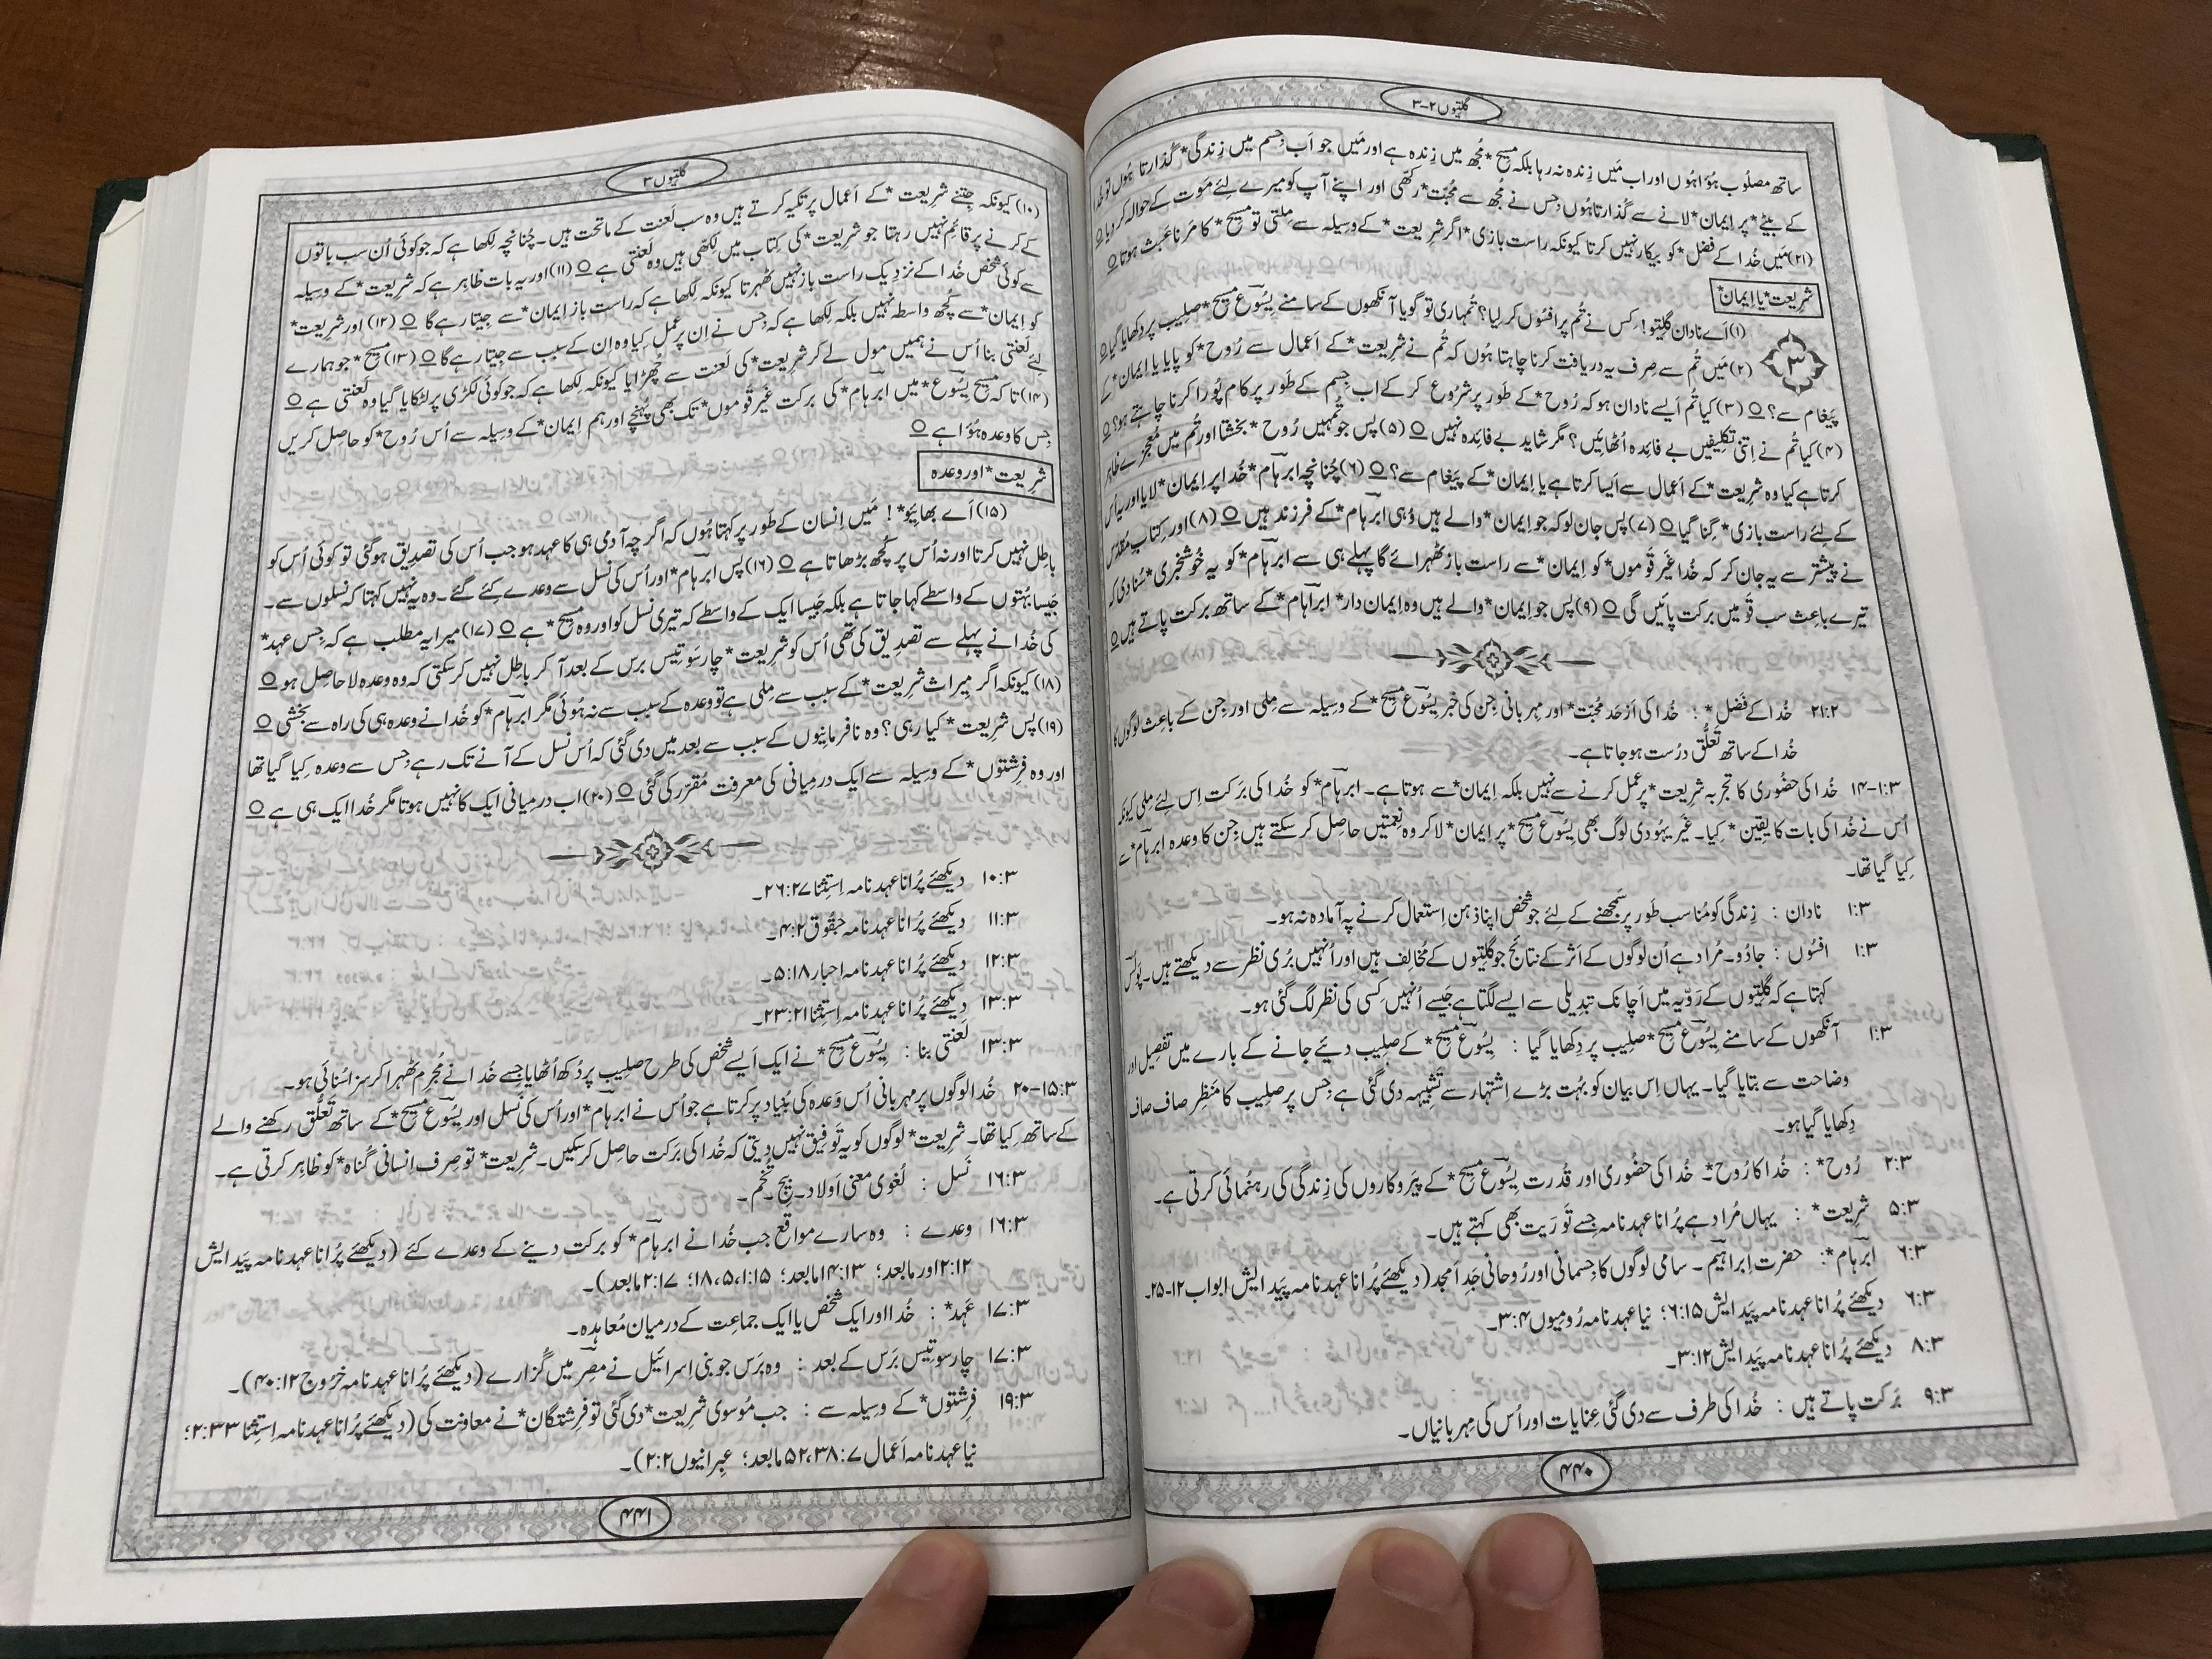 urdu-study-new-testament-2nd-edition-a-real-study-new-testament-pakistan-bible-society-2012-12-.jpg